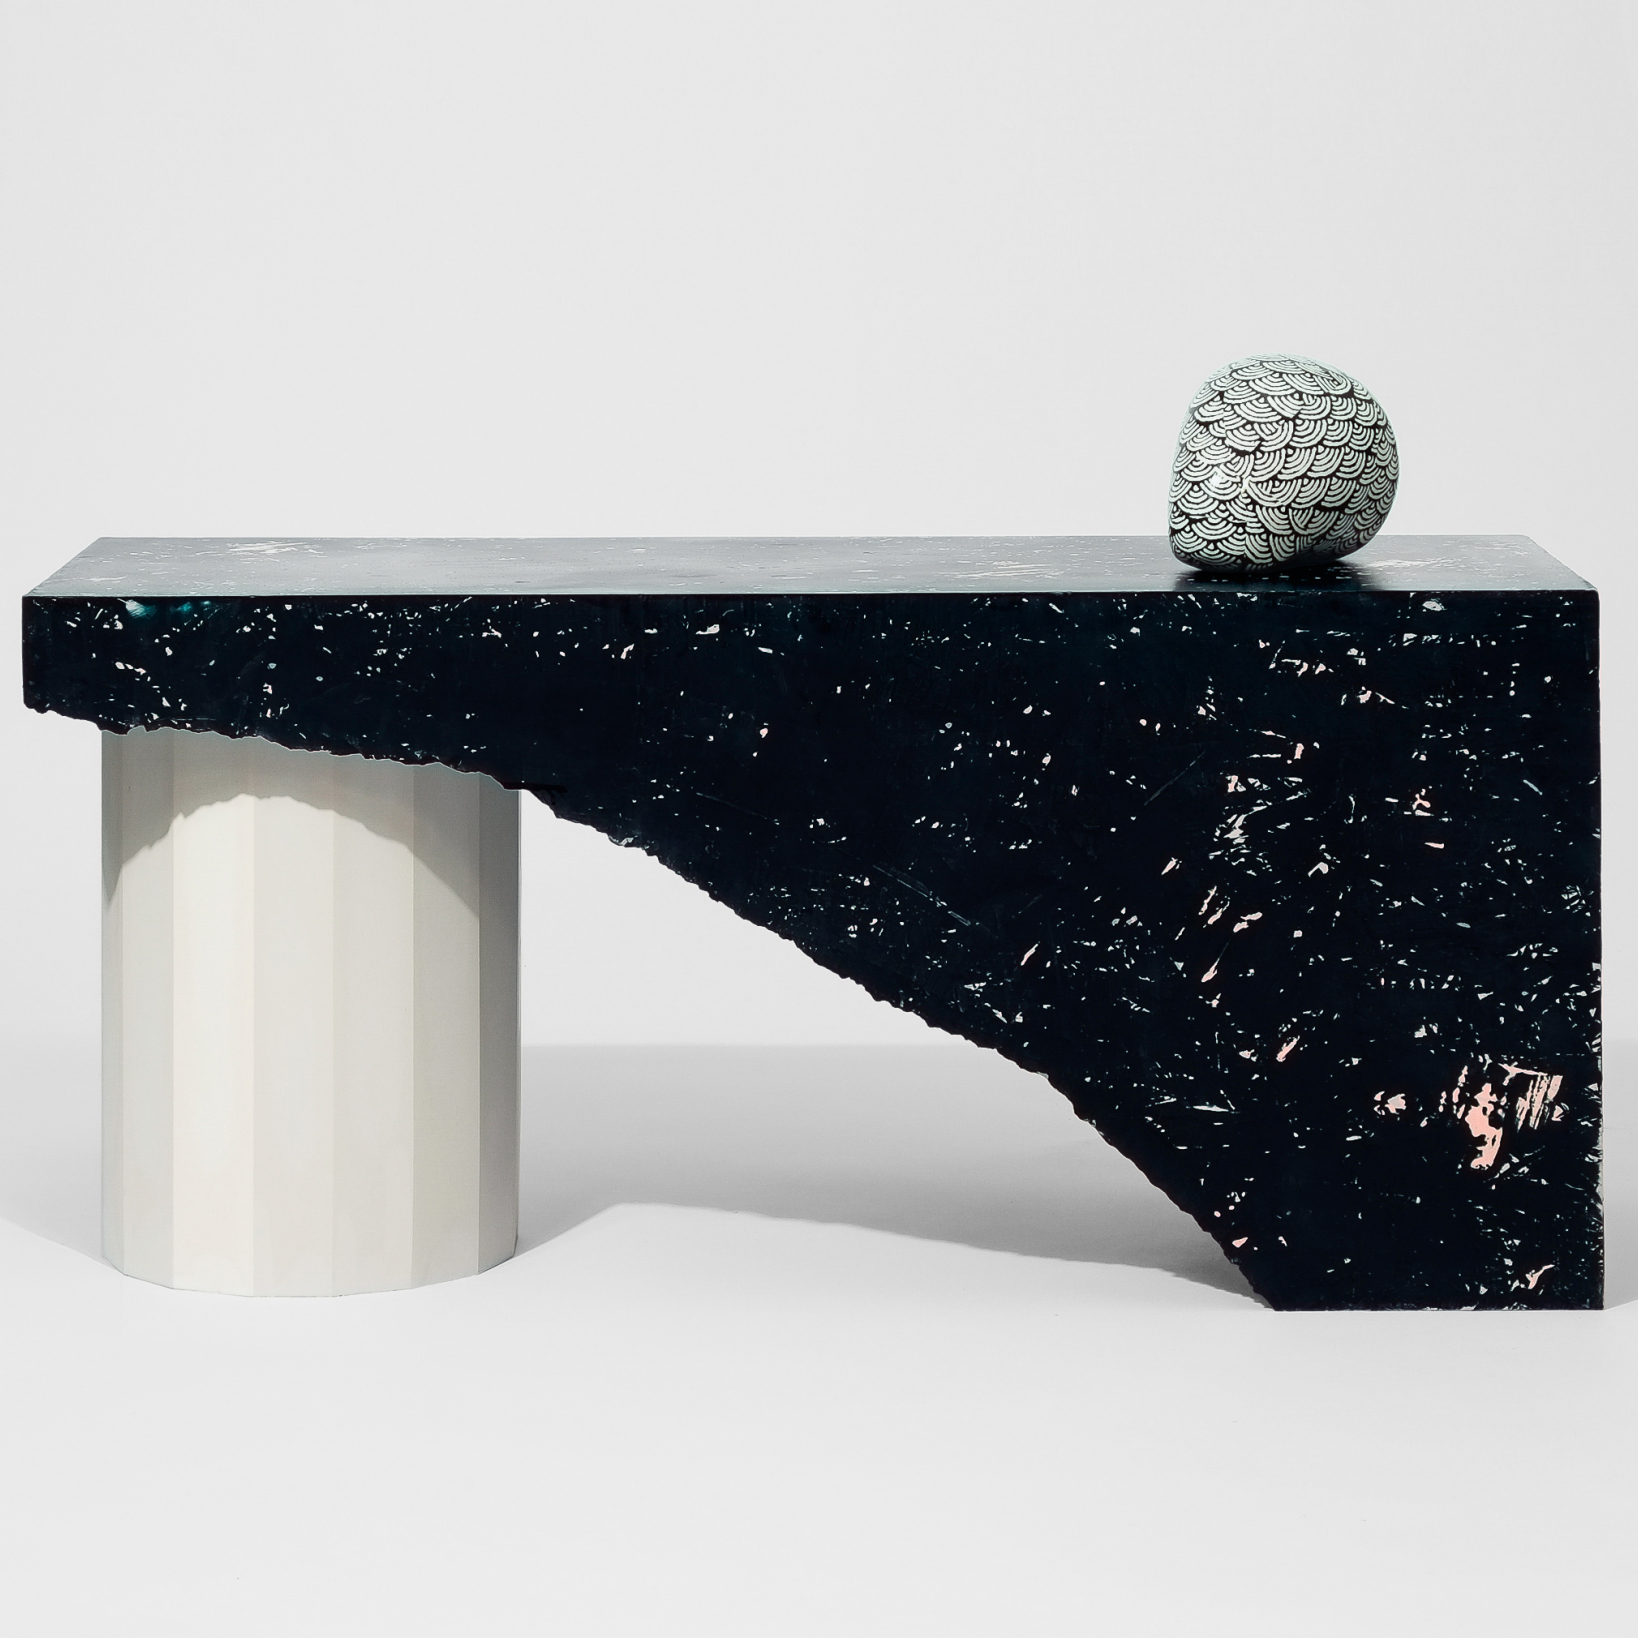 Andreason & Leibel (Swedish Design Pavilion)